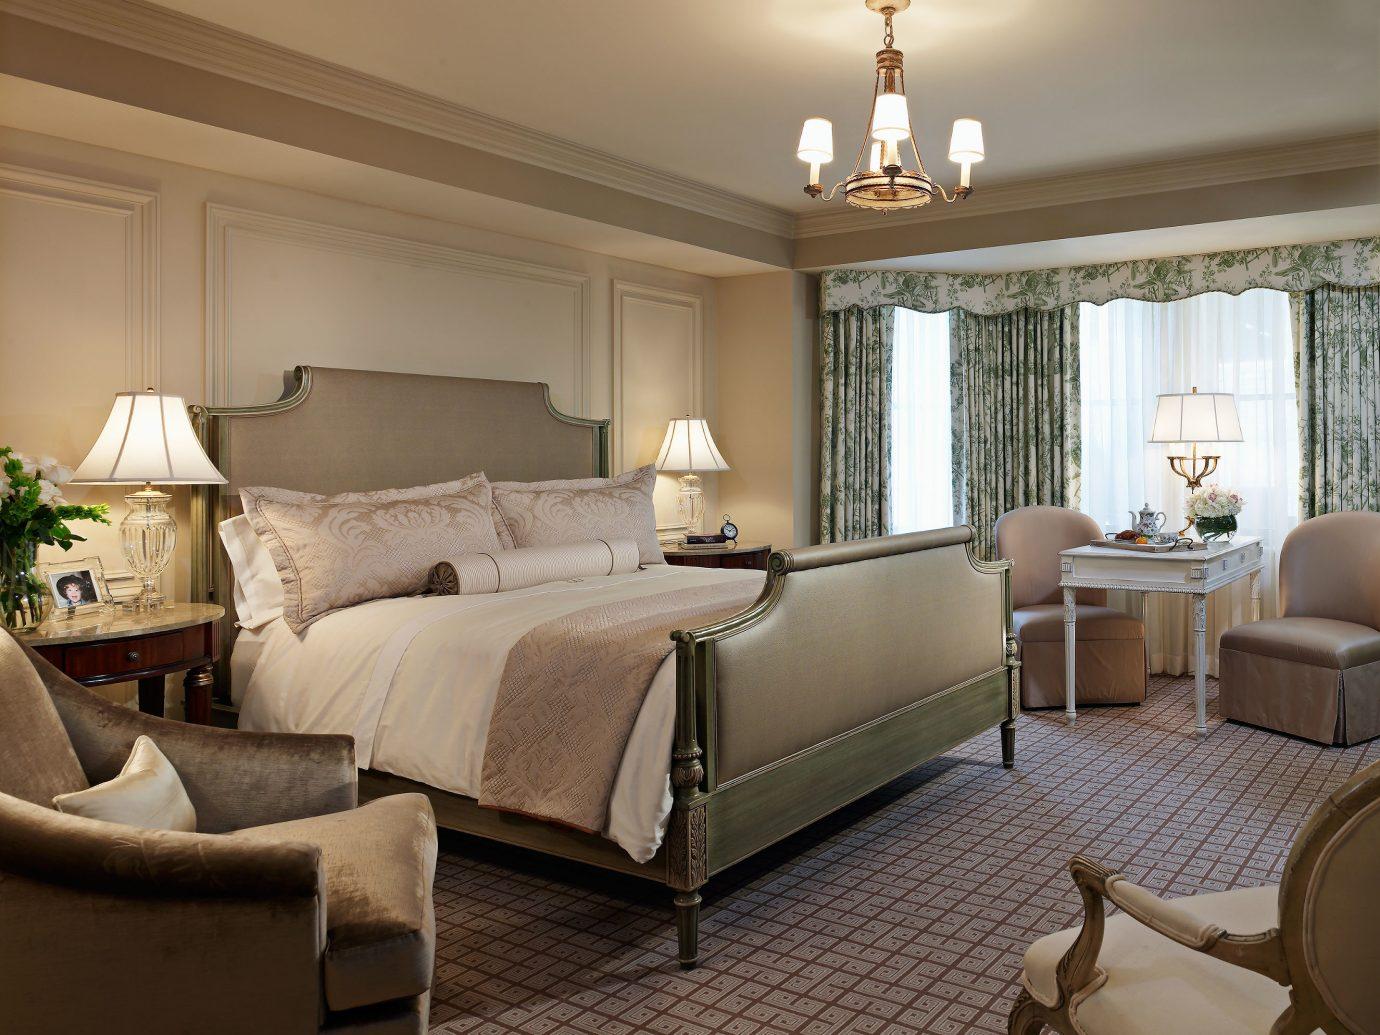 Bedroom at The Jefferson, Washington D.C.